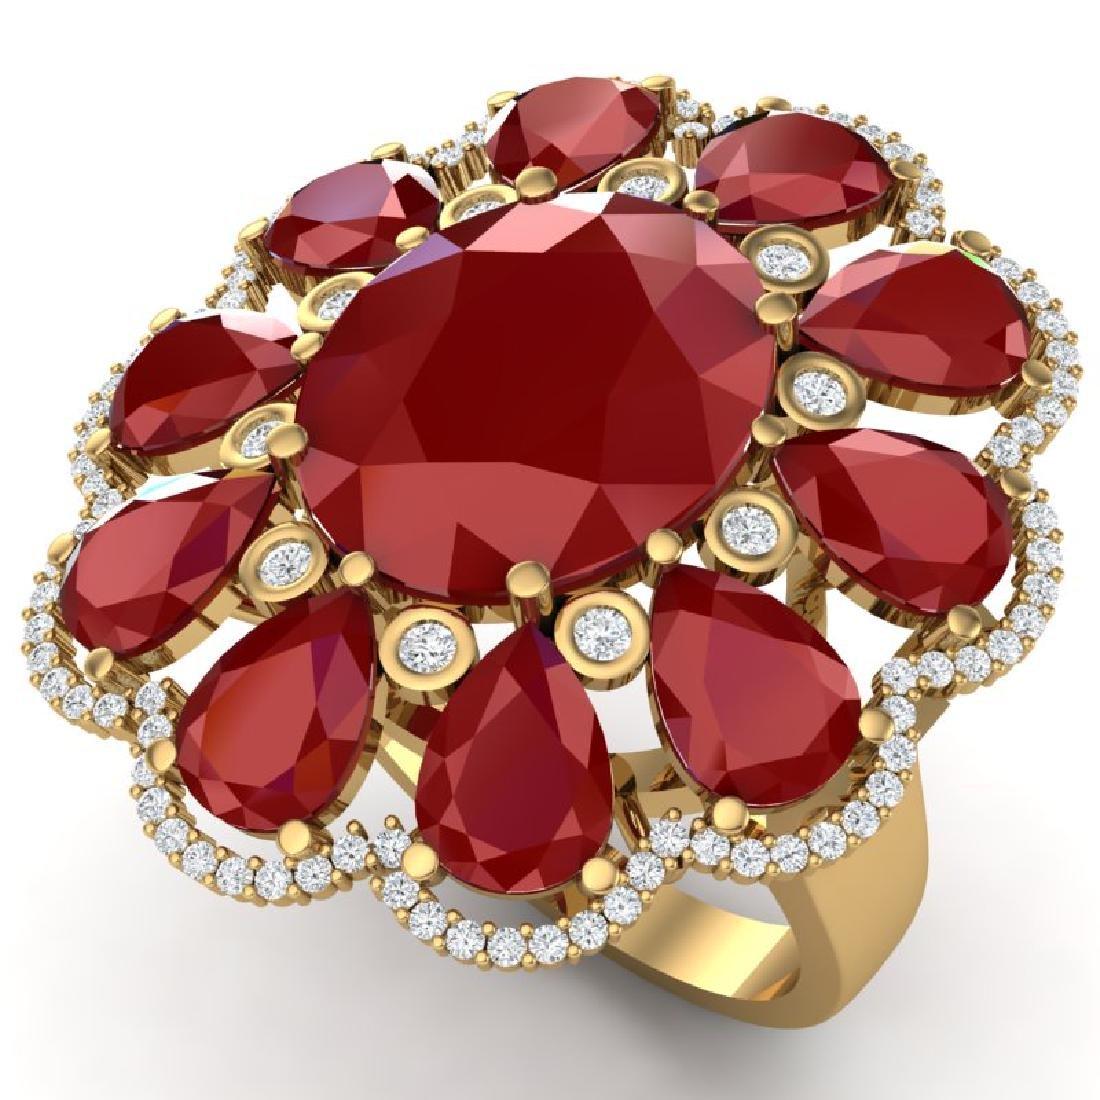 20.63 CTW Royalty Designer Ruby & VS Diamond Ring 18K